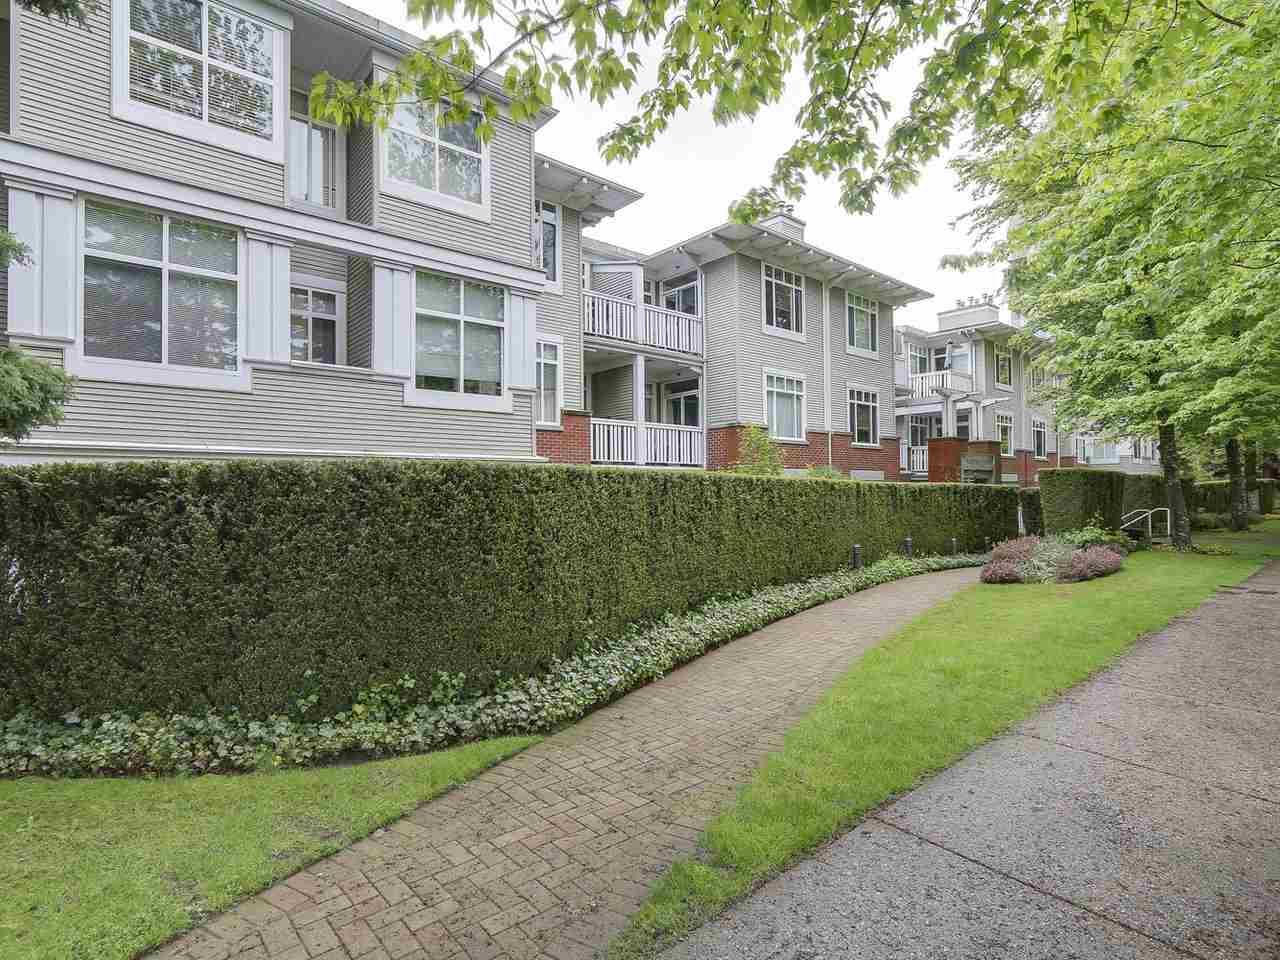 207 1675 W 10TH AVENUE, Vancouver, BC, V6J 2A2 Primary Photo